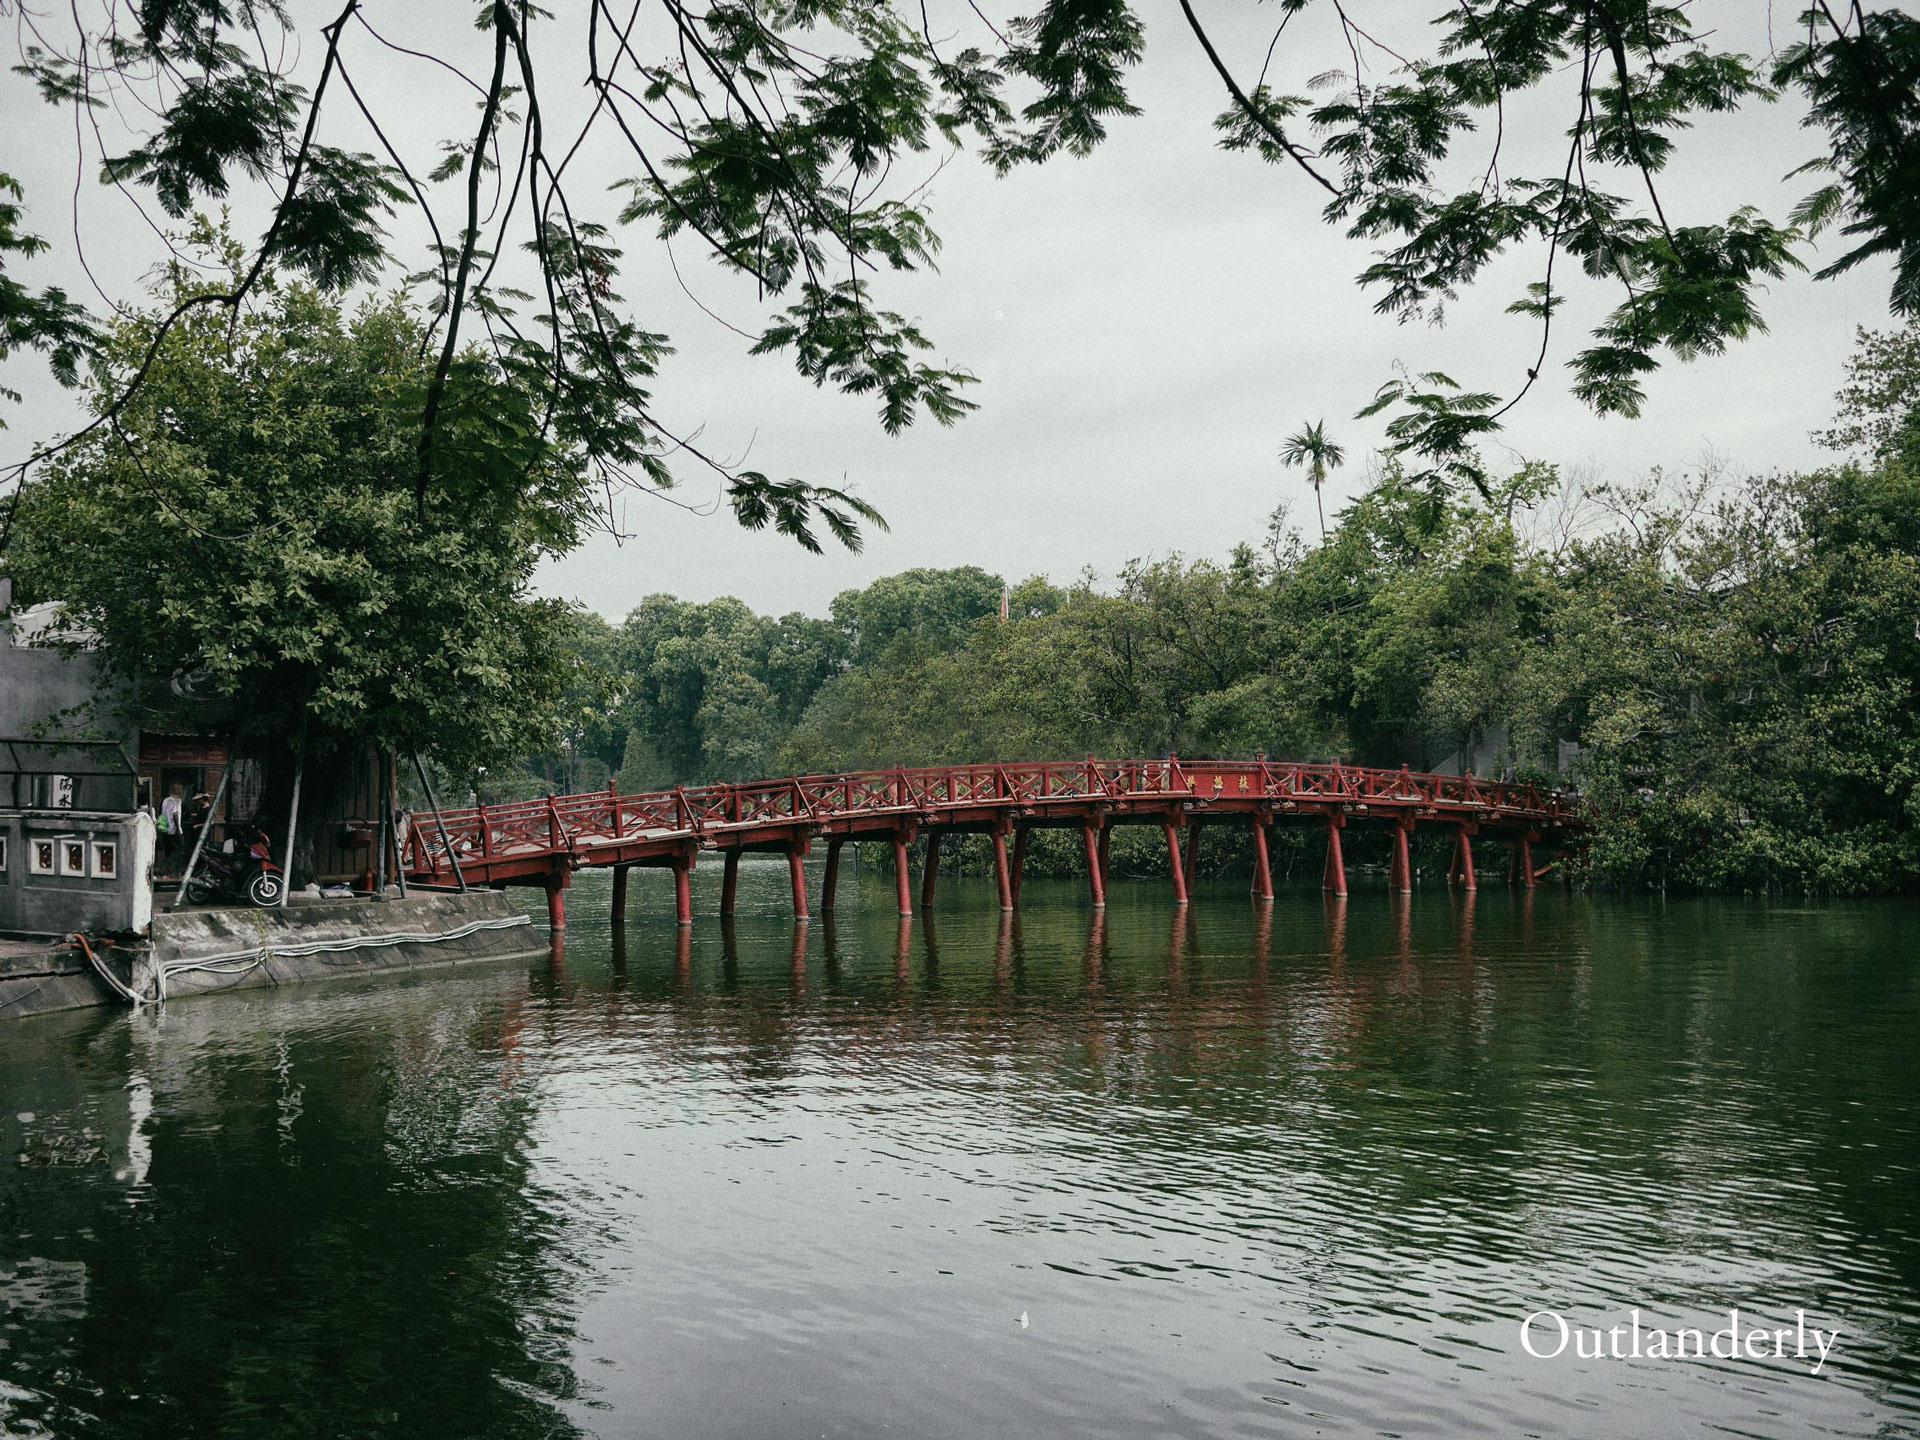 Hoan-Kiem-Lake-Outlanderly-Travel